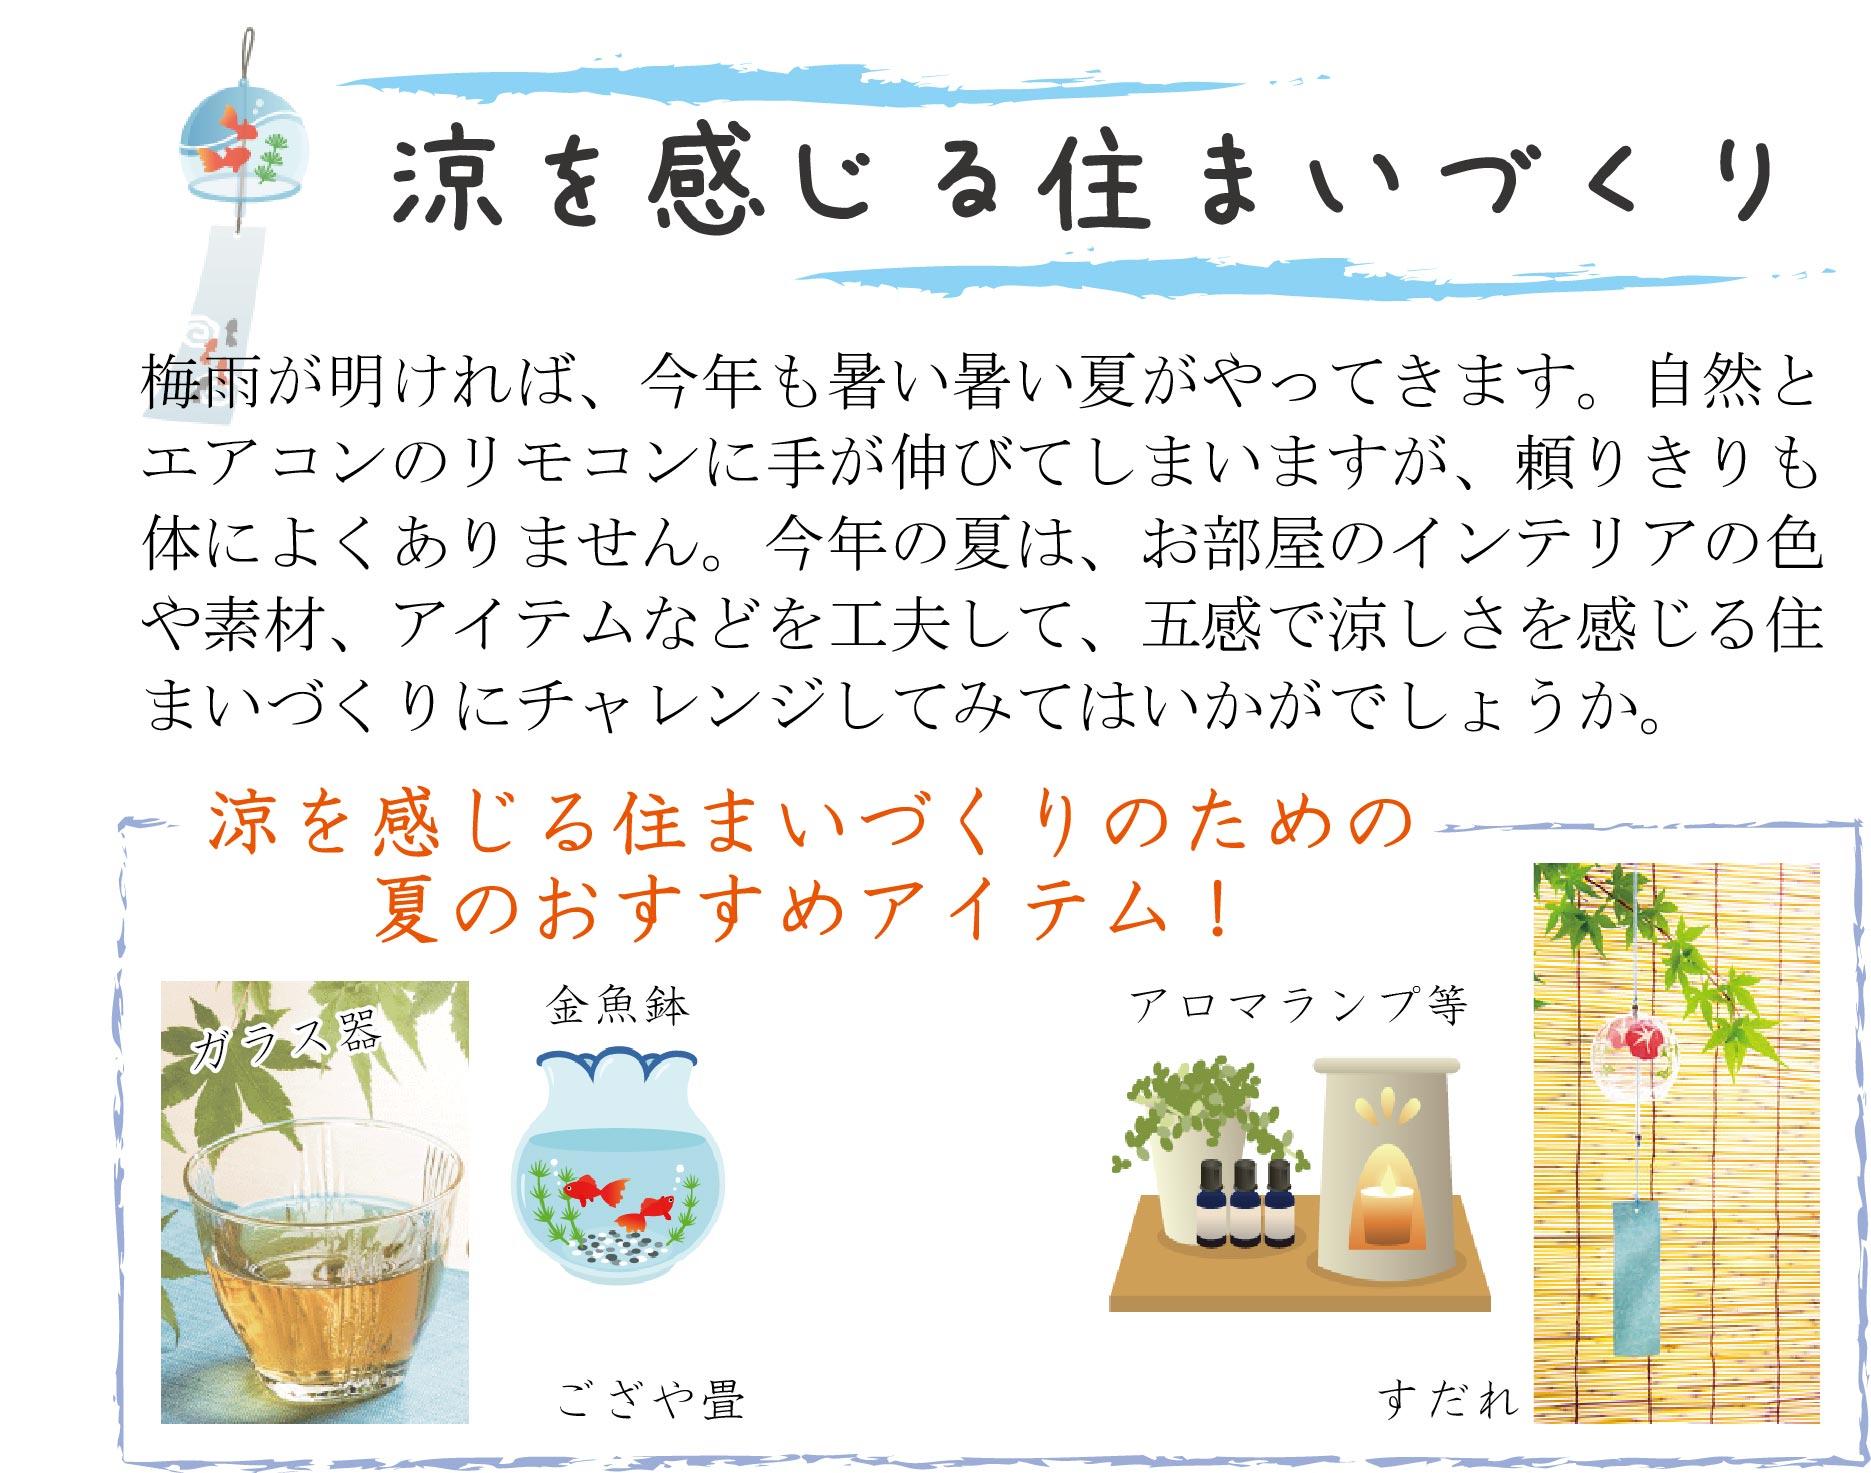 KuraSi-natu-sin86-12.jpg